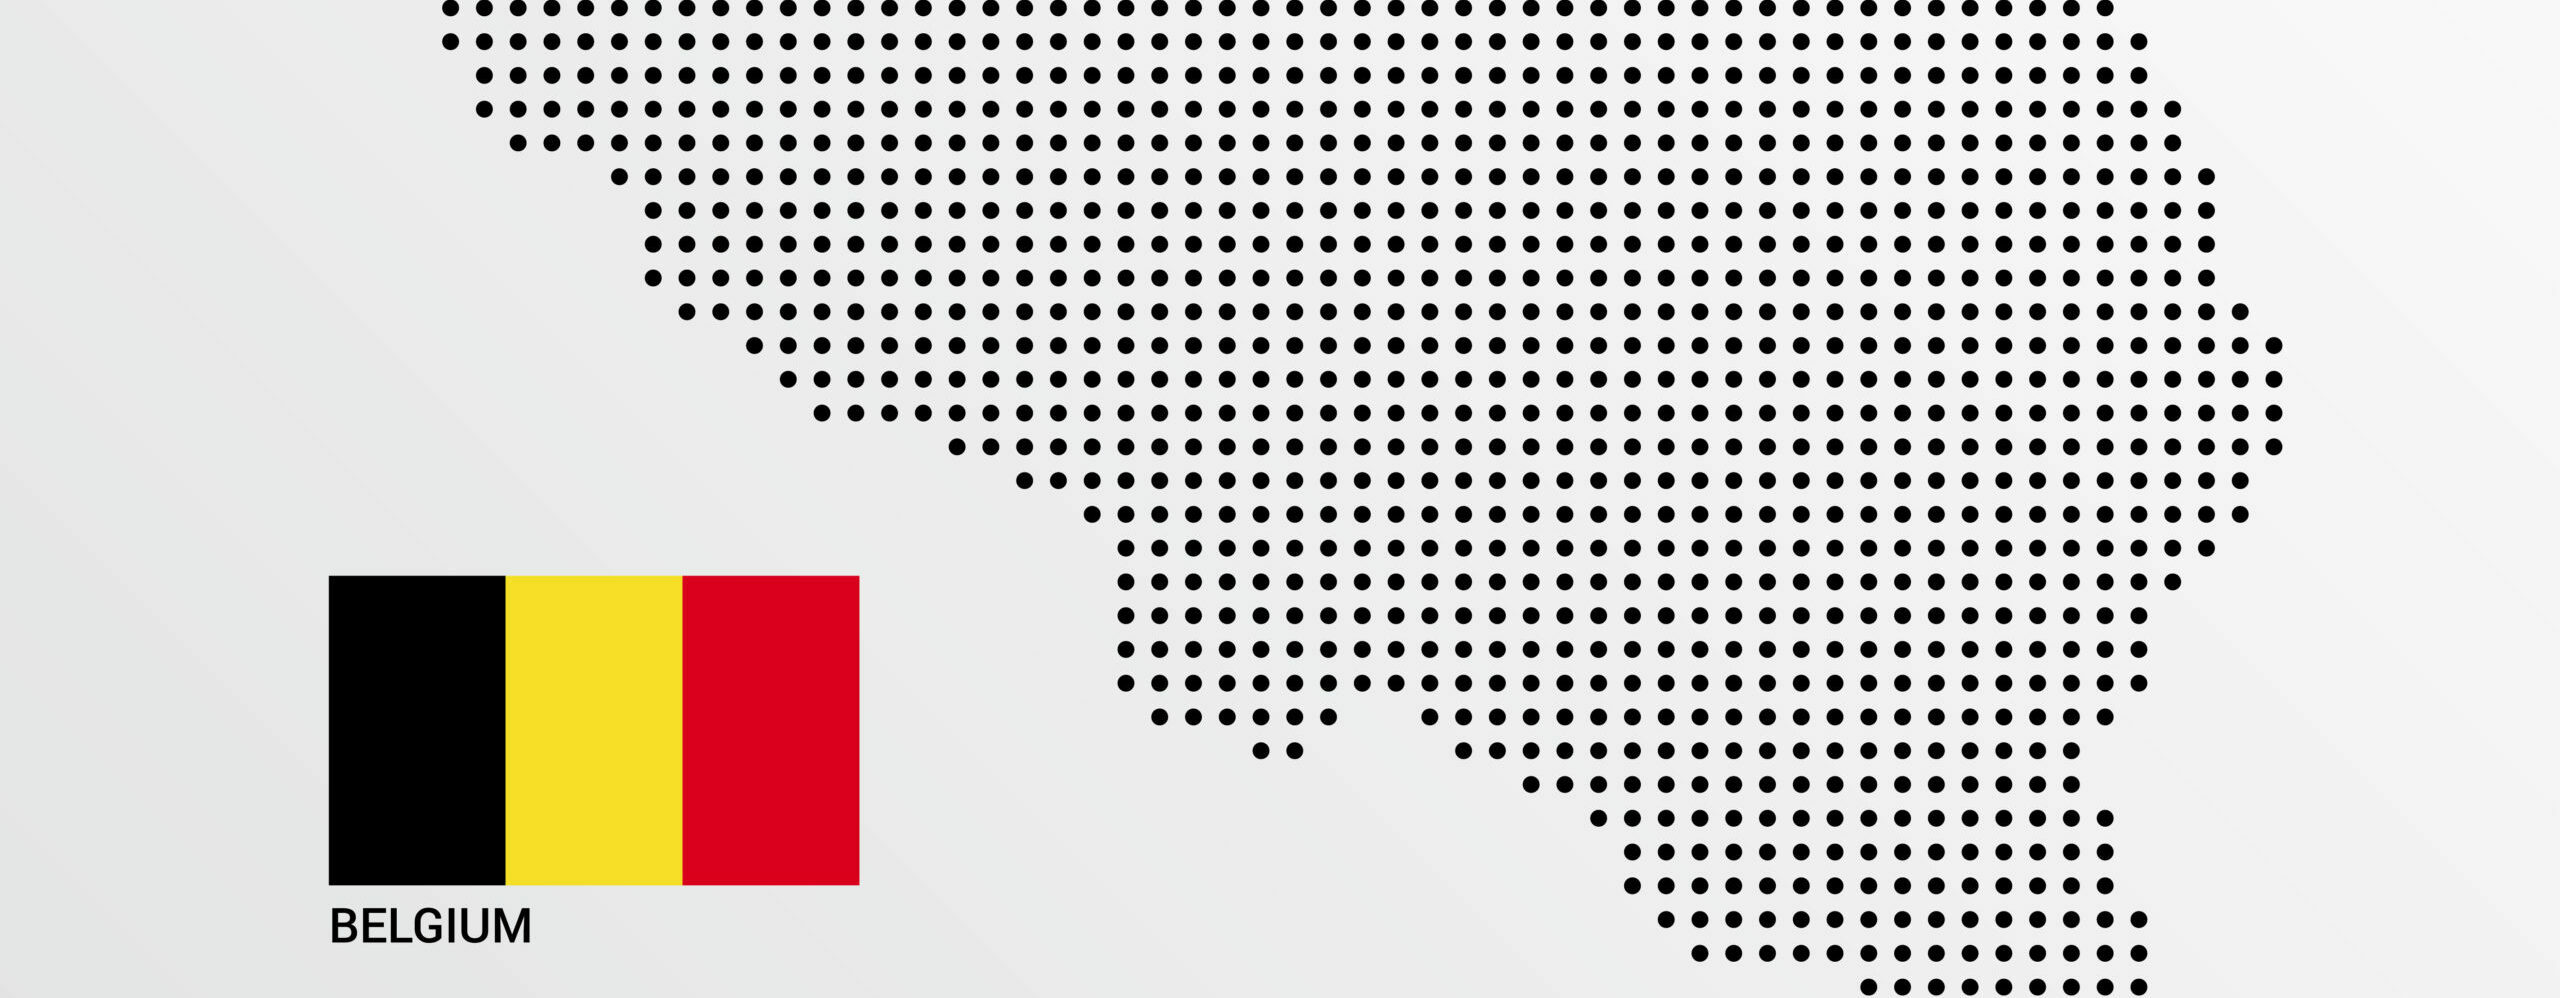 Background vector created by flatart - www.freepik.com